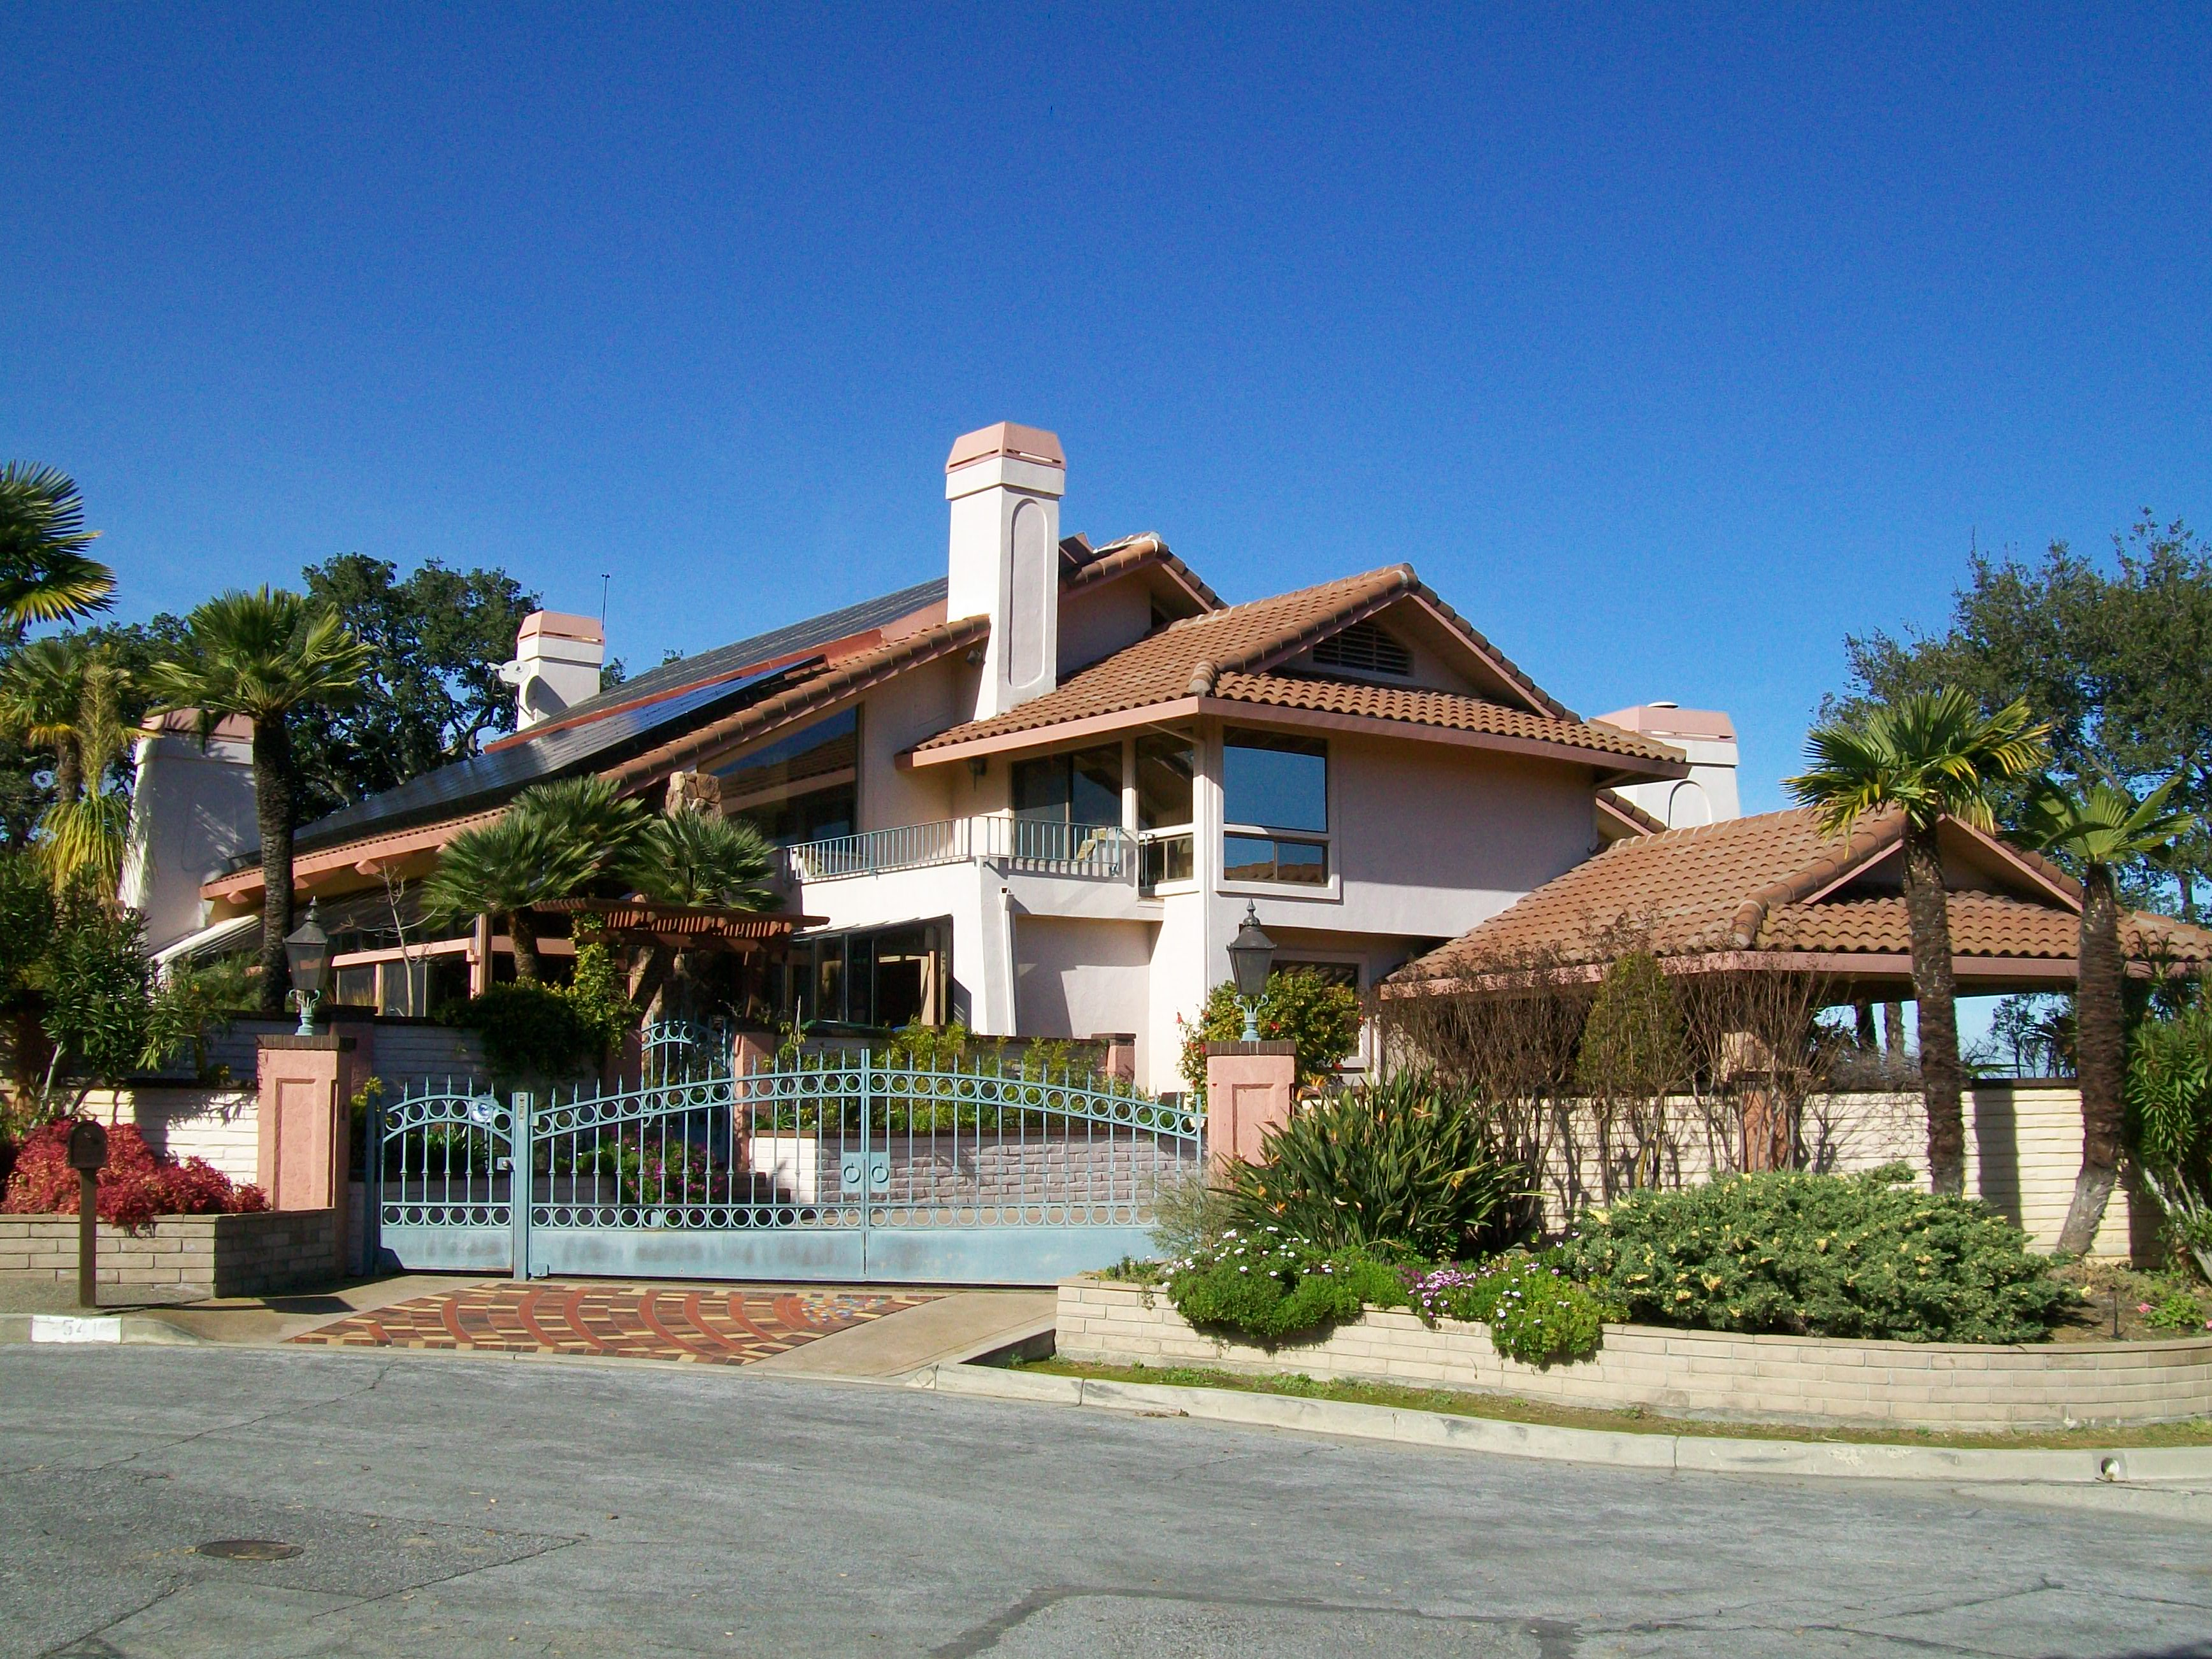 Santa Rosa home - Santa Rosa Drive and Sierra Azule neighborhood